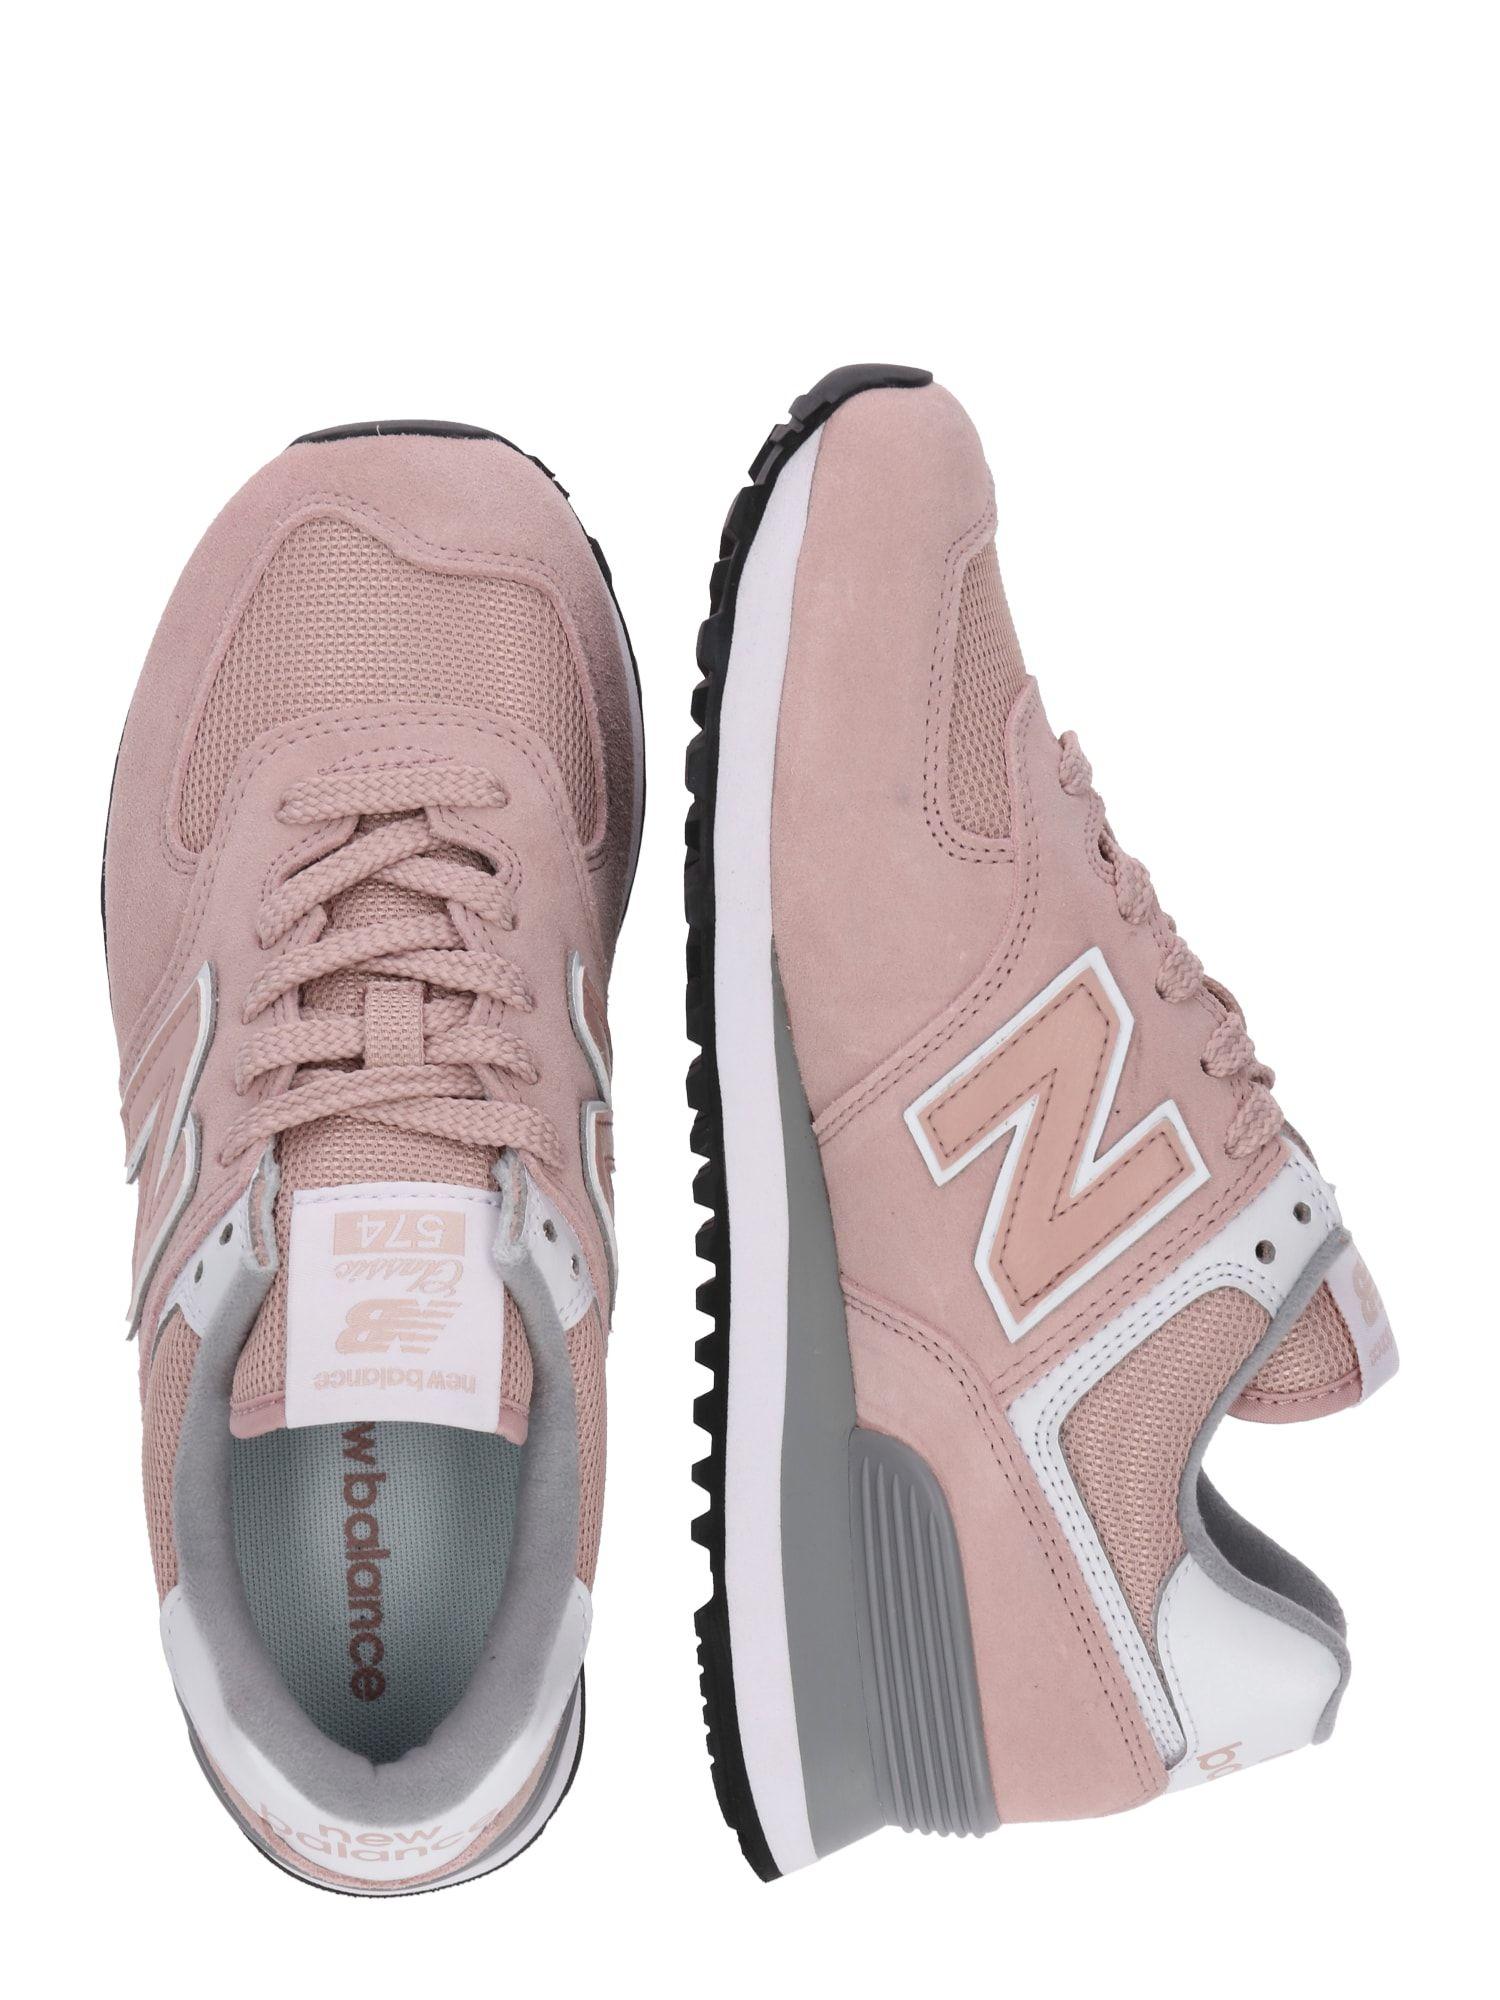 New Balance Sneaker '574' Damen, Rosé, Größe 42.5 | Sneaker ...